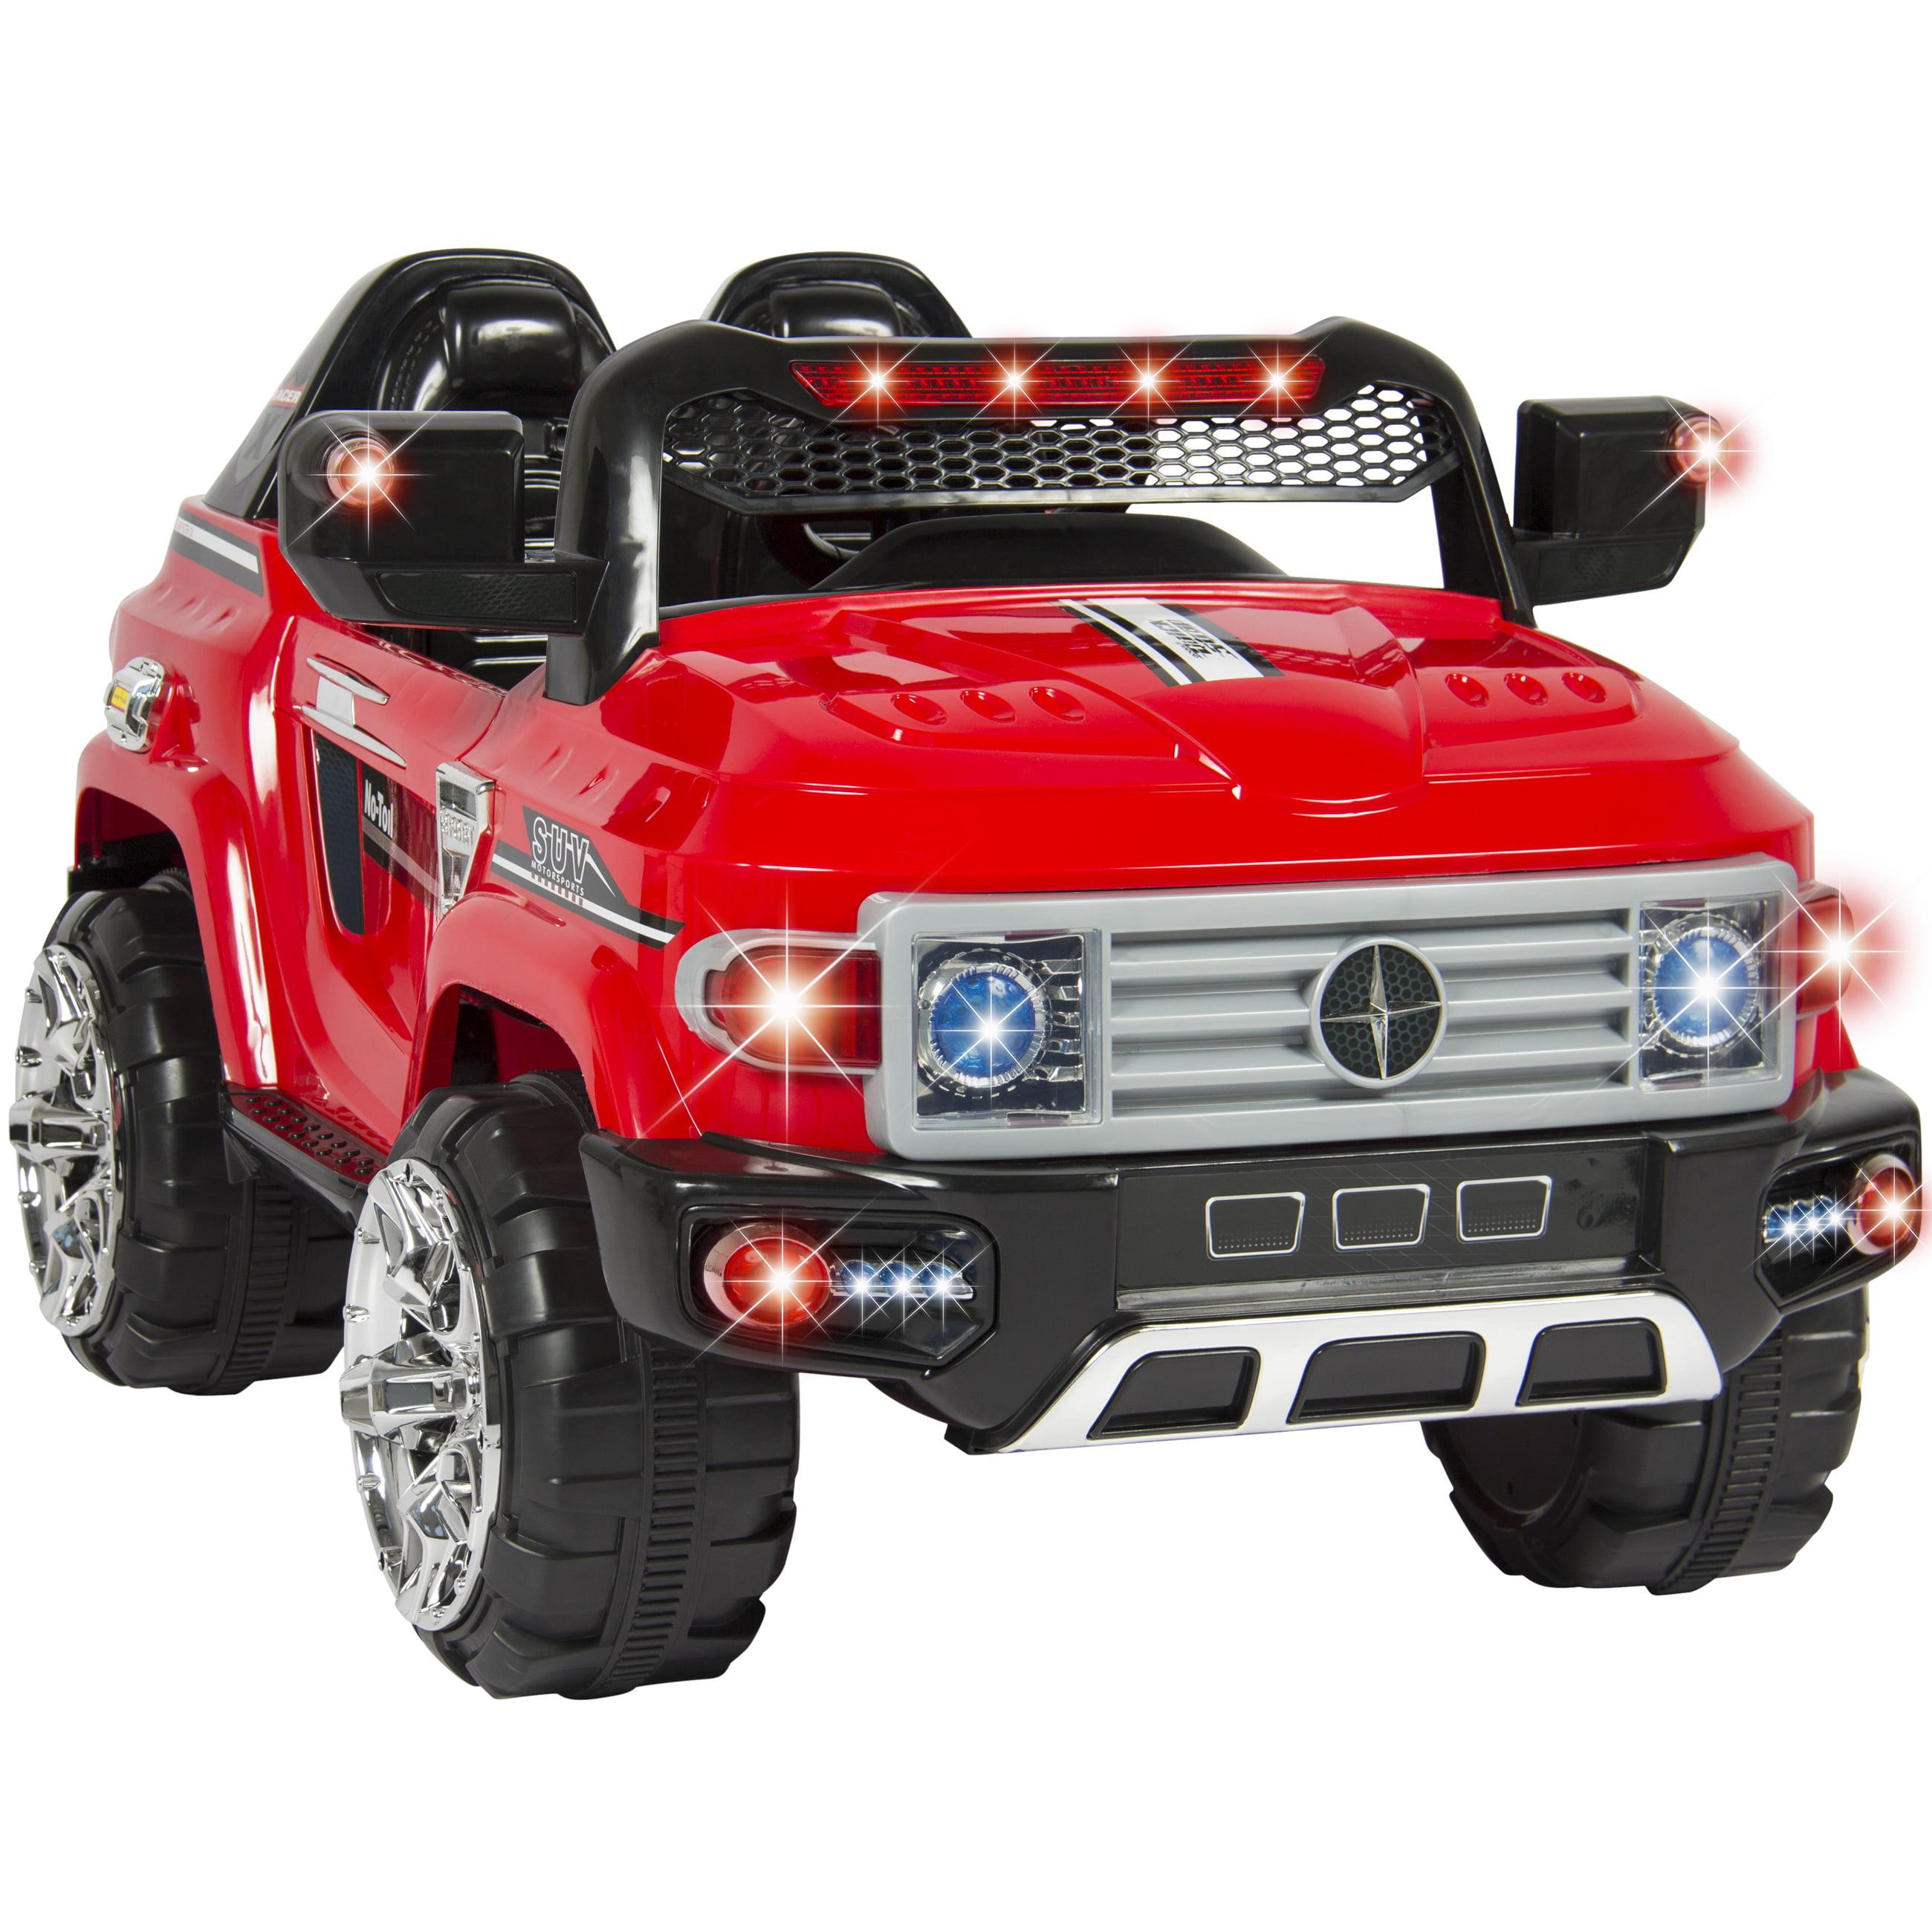 Best Choice Products 12v Kids Remote Control Truck Suv Ride On Car W 2 Speeds Led Lights Mp3 Parent Control Red Walmart Com Walmart Com